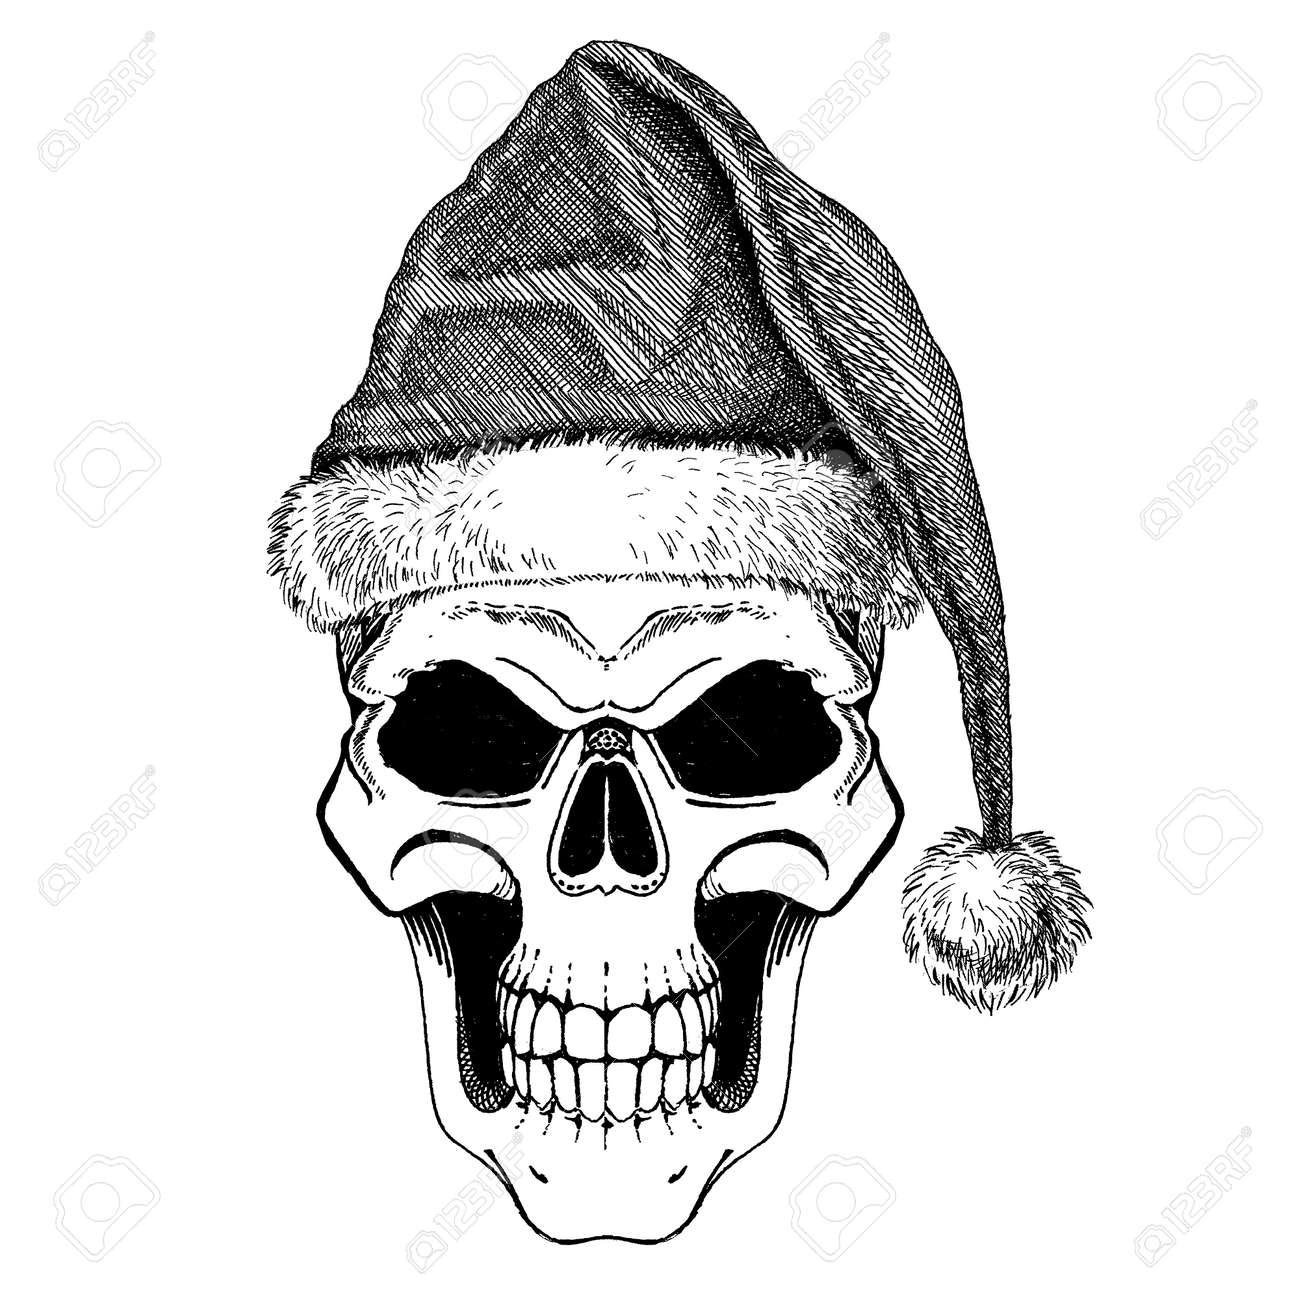 Heavy Metal Christmas.The Skull Of Santa Claus Happy Rock Or Heavy Metal Christmas